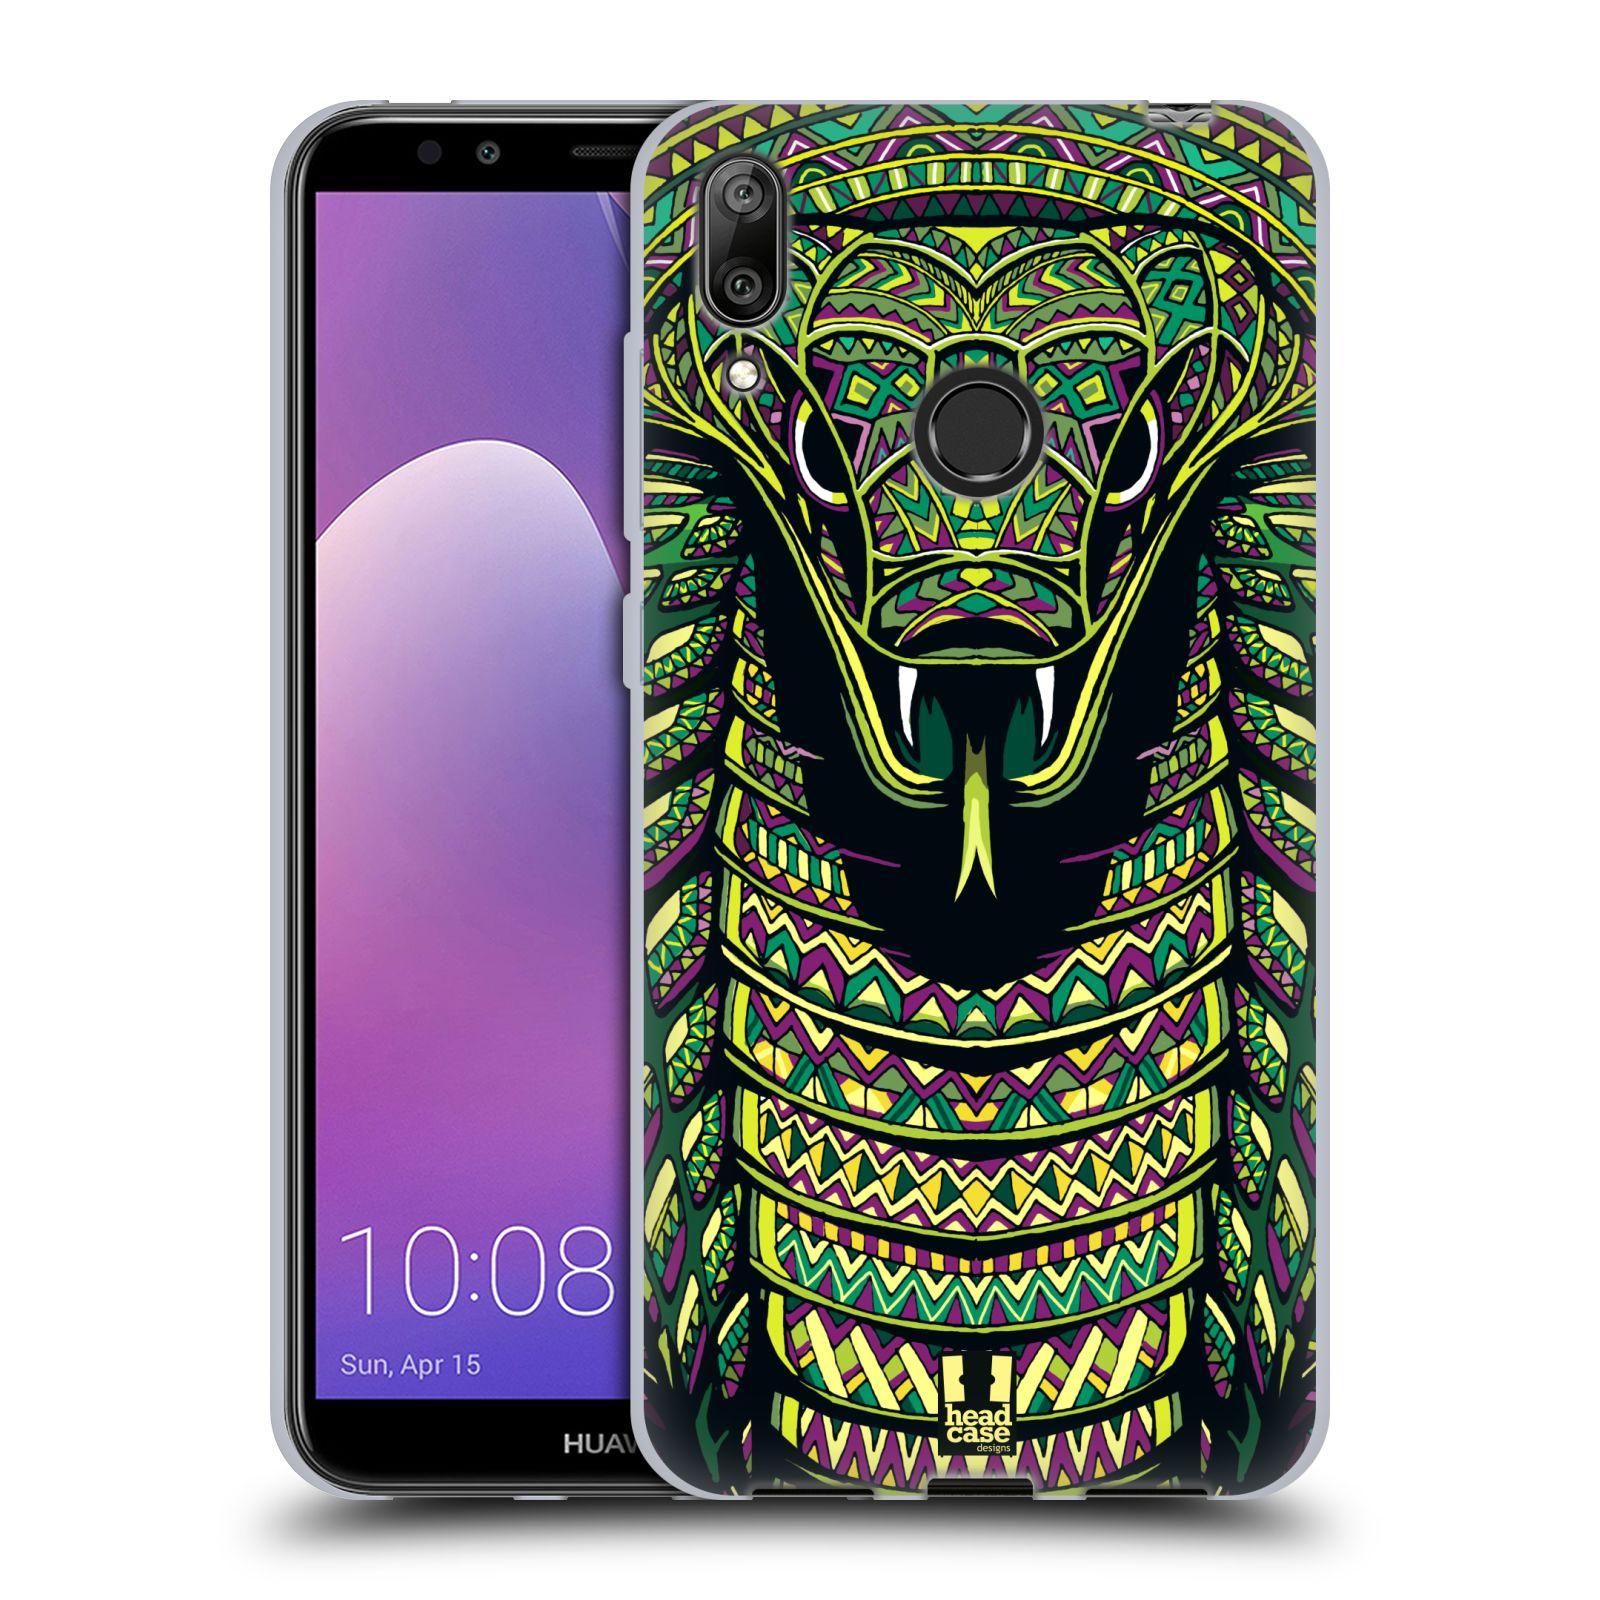 Silikonové pouzdro na mobil Huawei Y7 (2019) - Head Case - AZTEC HAD